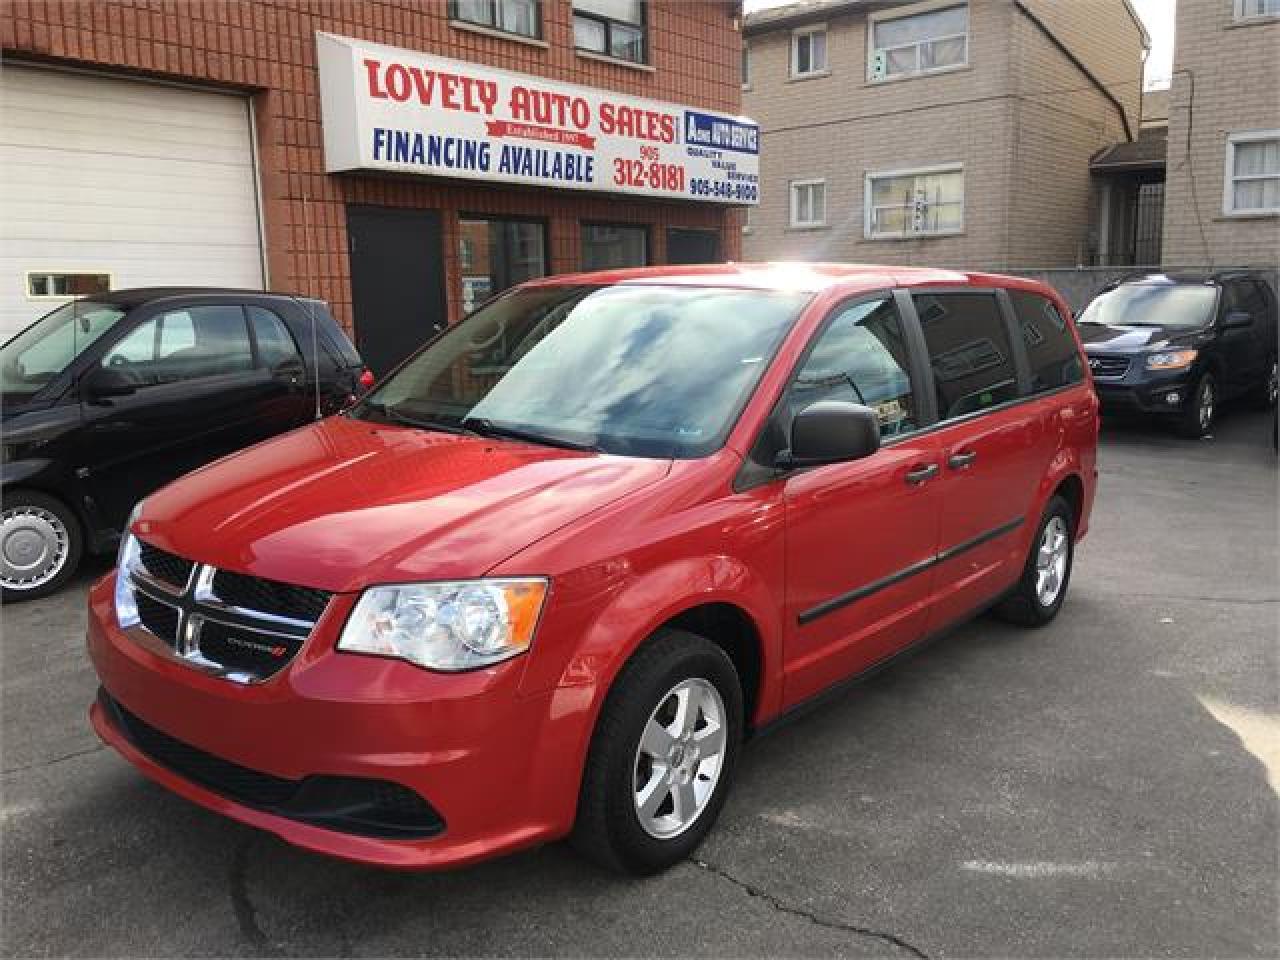 Lovely Auto Sales Ltd Hamilton >> Find Used Cars Suvs Minivans Trucks For Sale In Hamilton